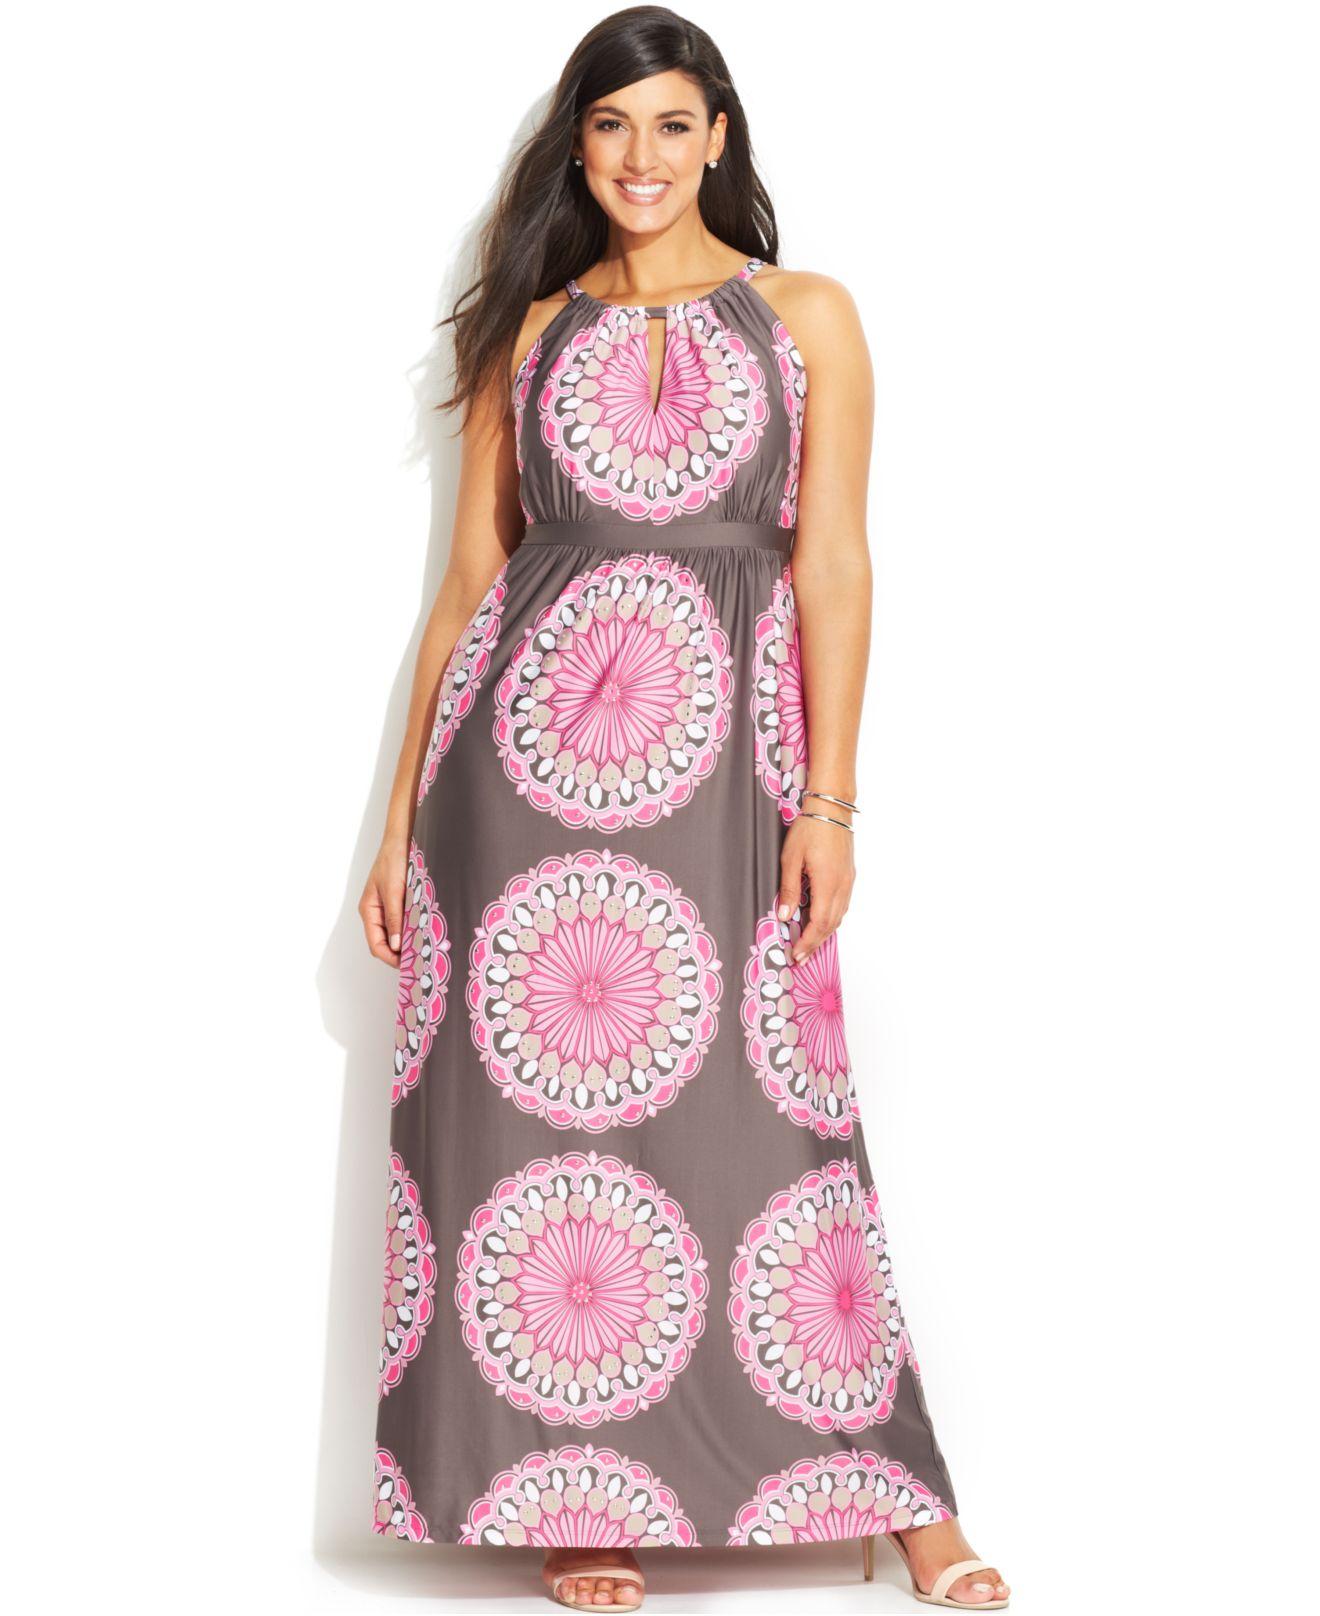 Lyst - Inc International Concepts Plus Size Printed Keyhole Maxi Dress